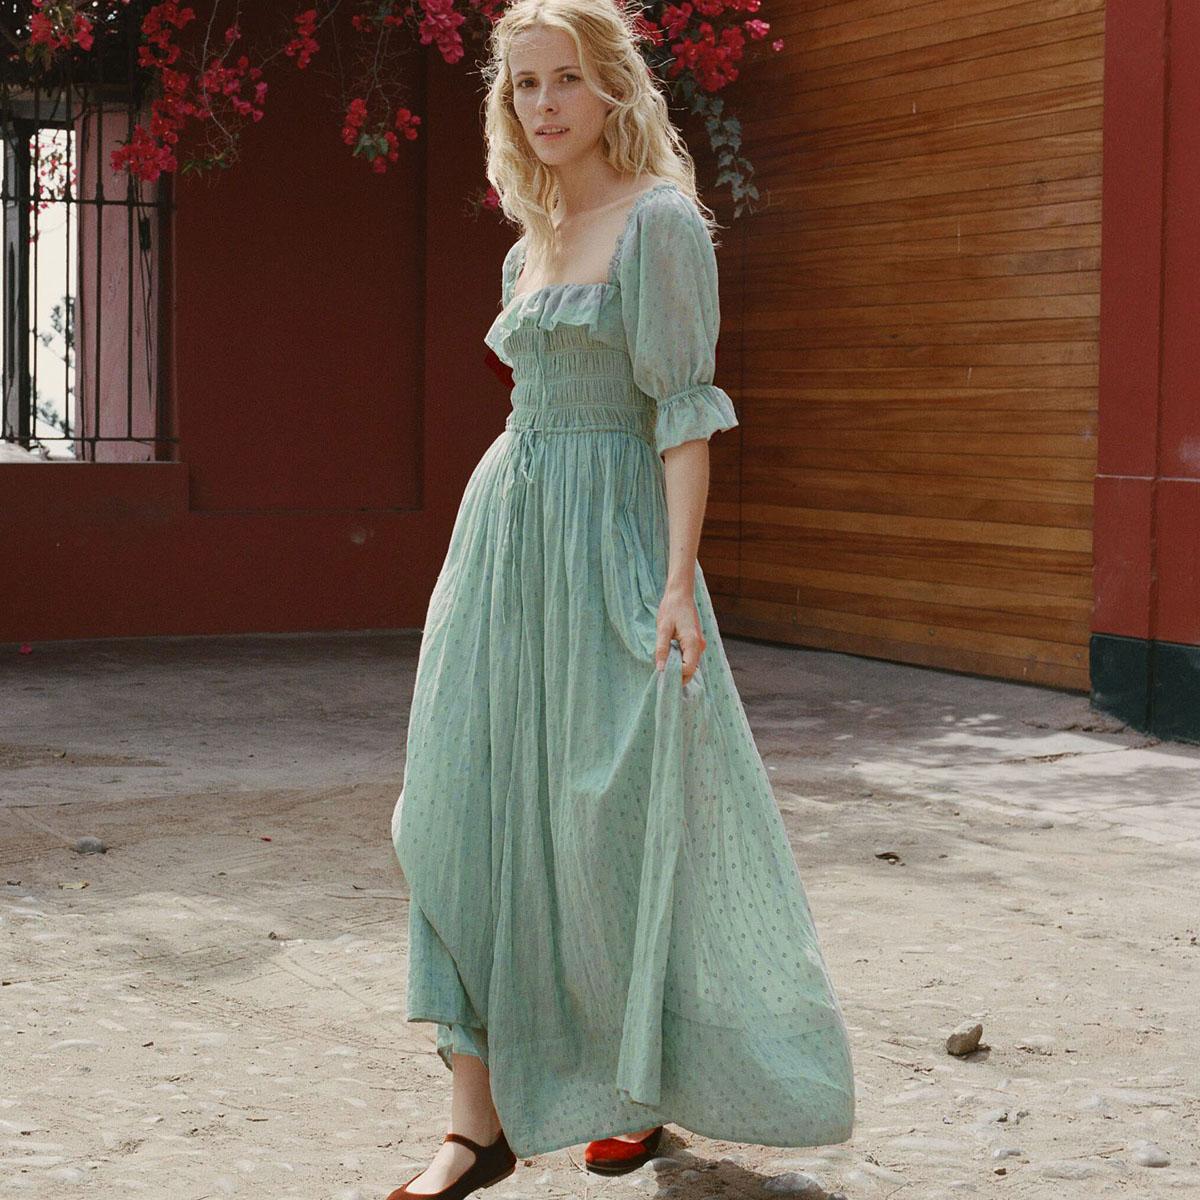 Jastie Stretch Frill Bodice Sexy Dress Ruffle Neck Puff Sleeve Boho Dresses Women Casual Beach Dress 2018 Summer Midi Dresses